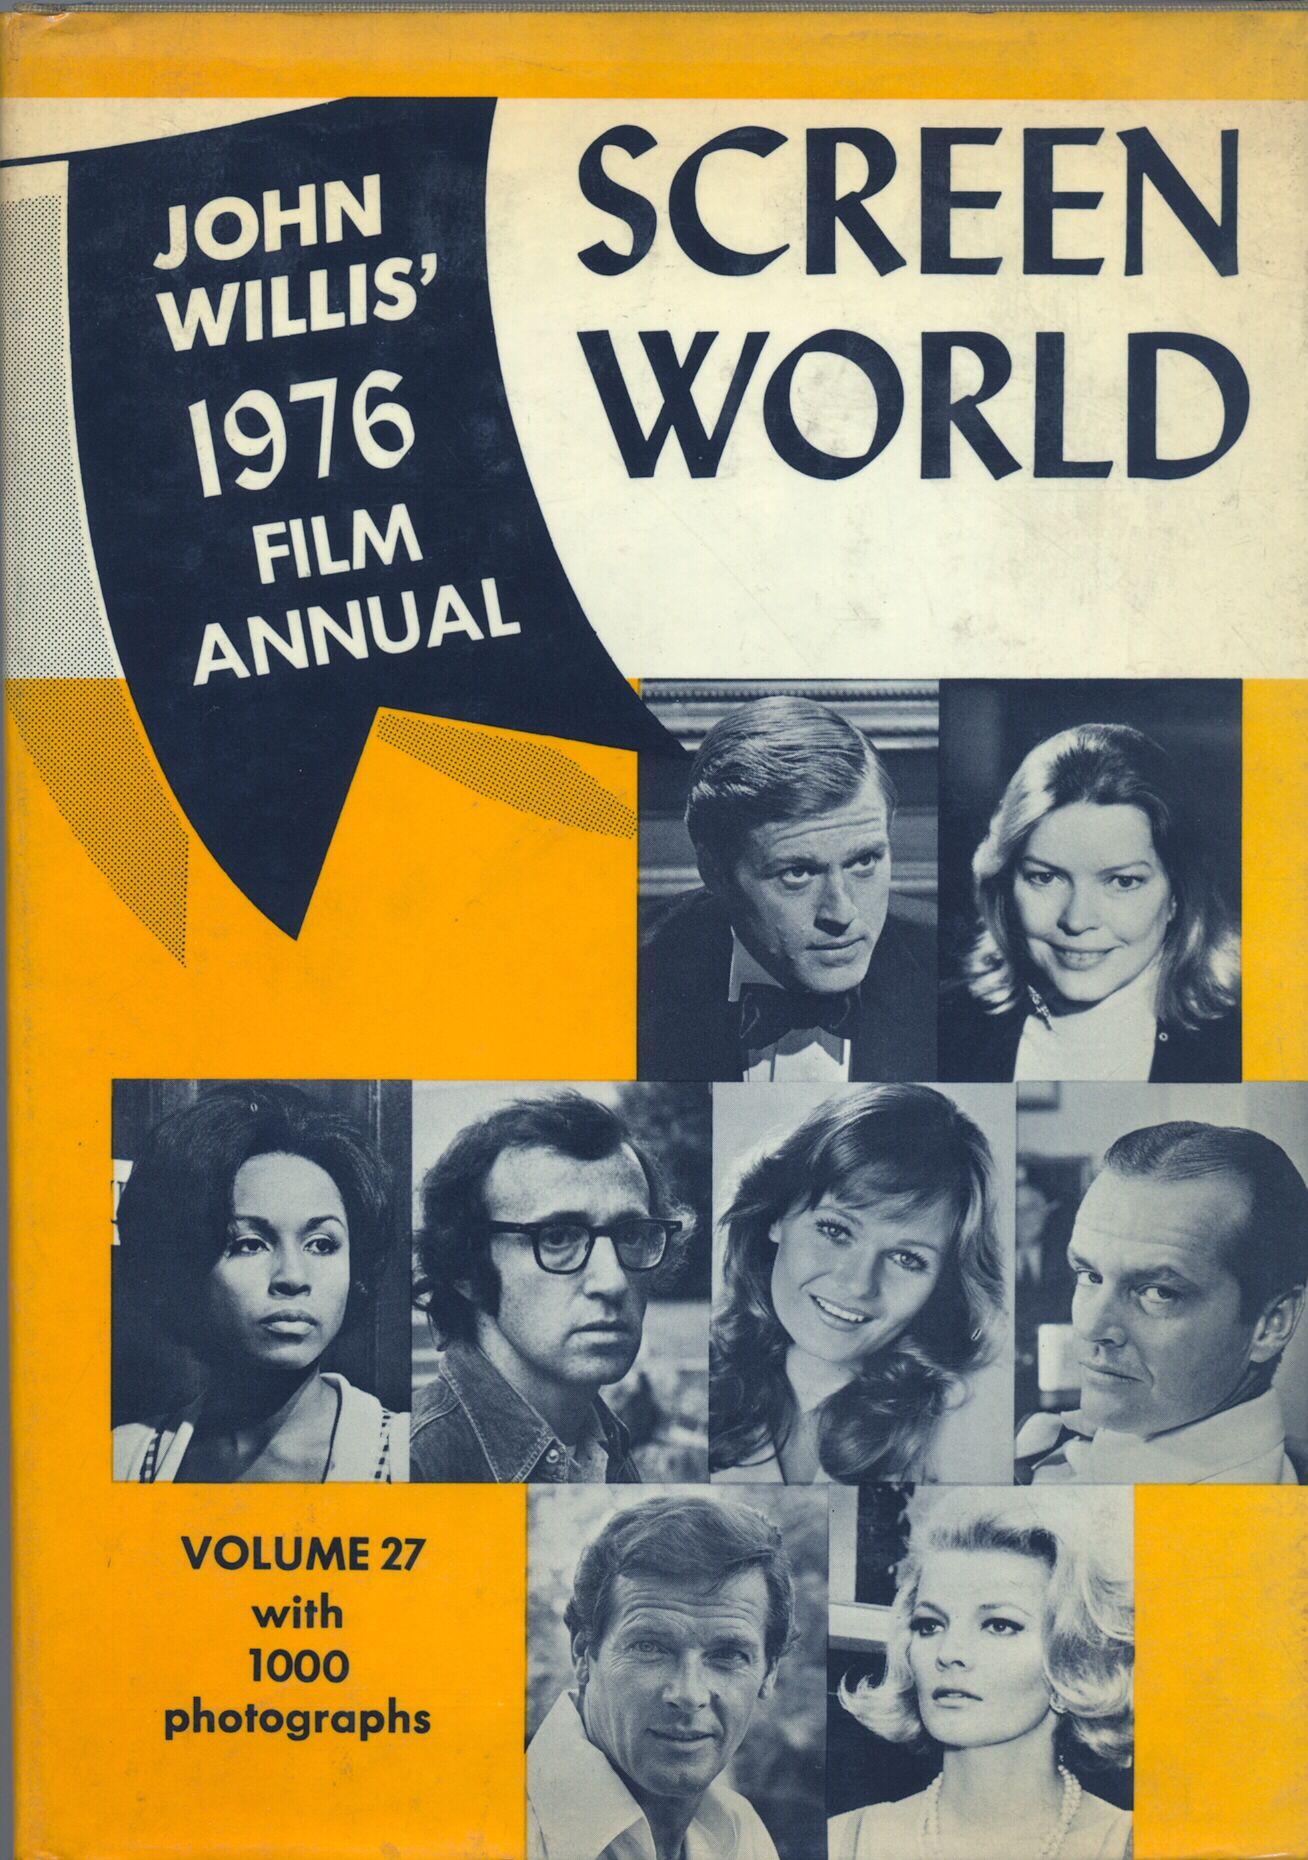 Screen World 1976, Vol. 27